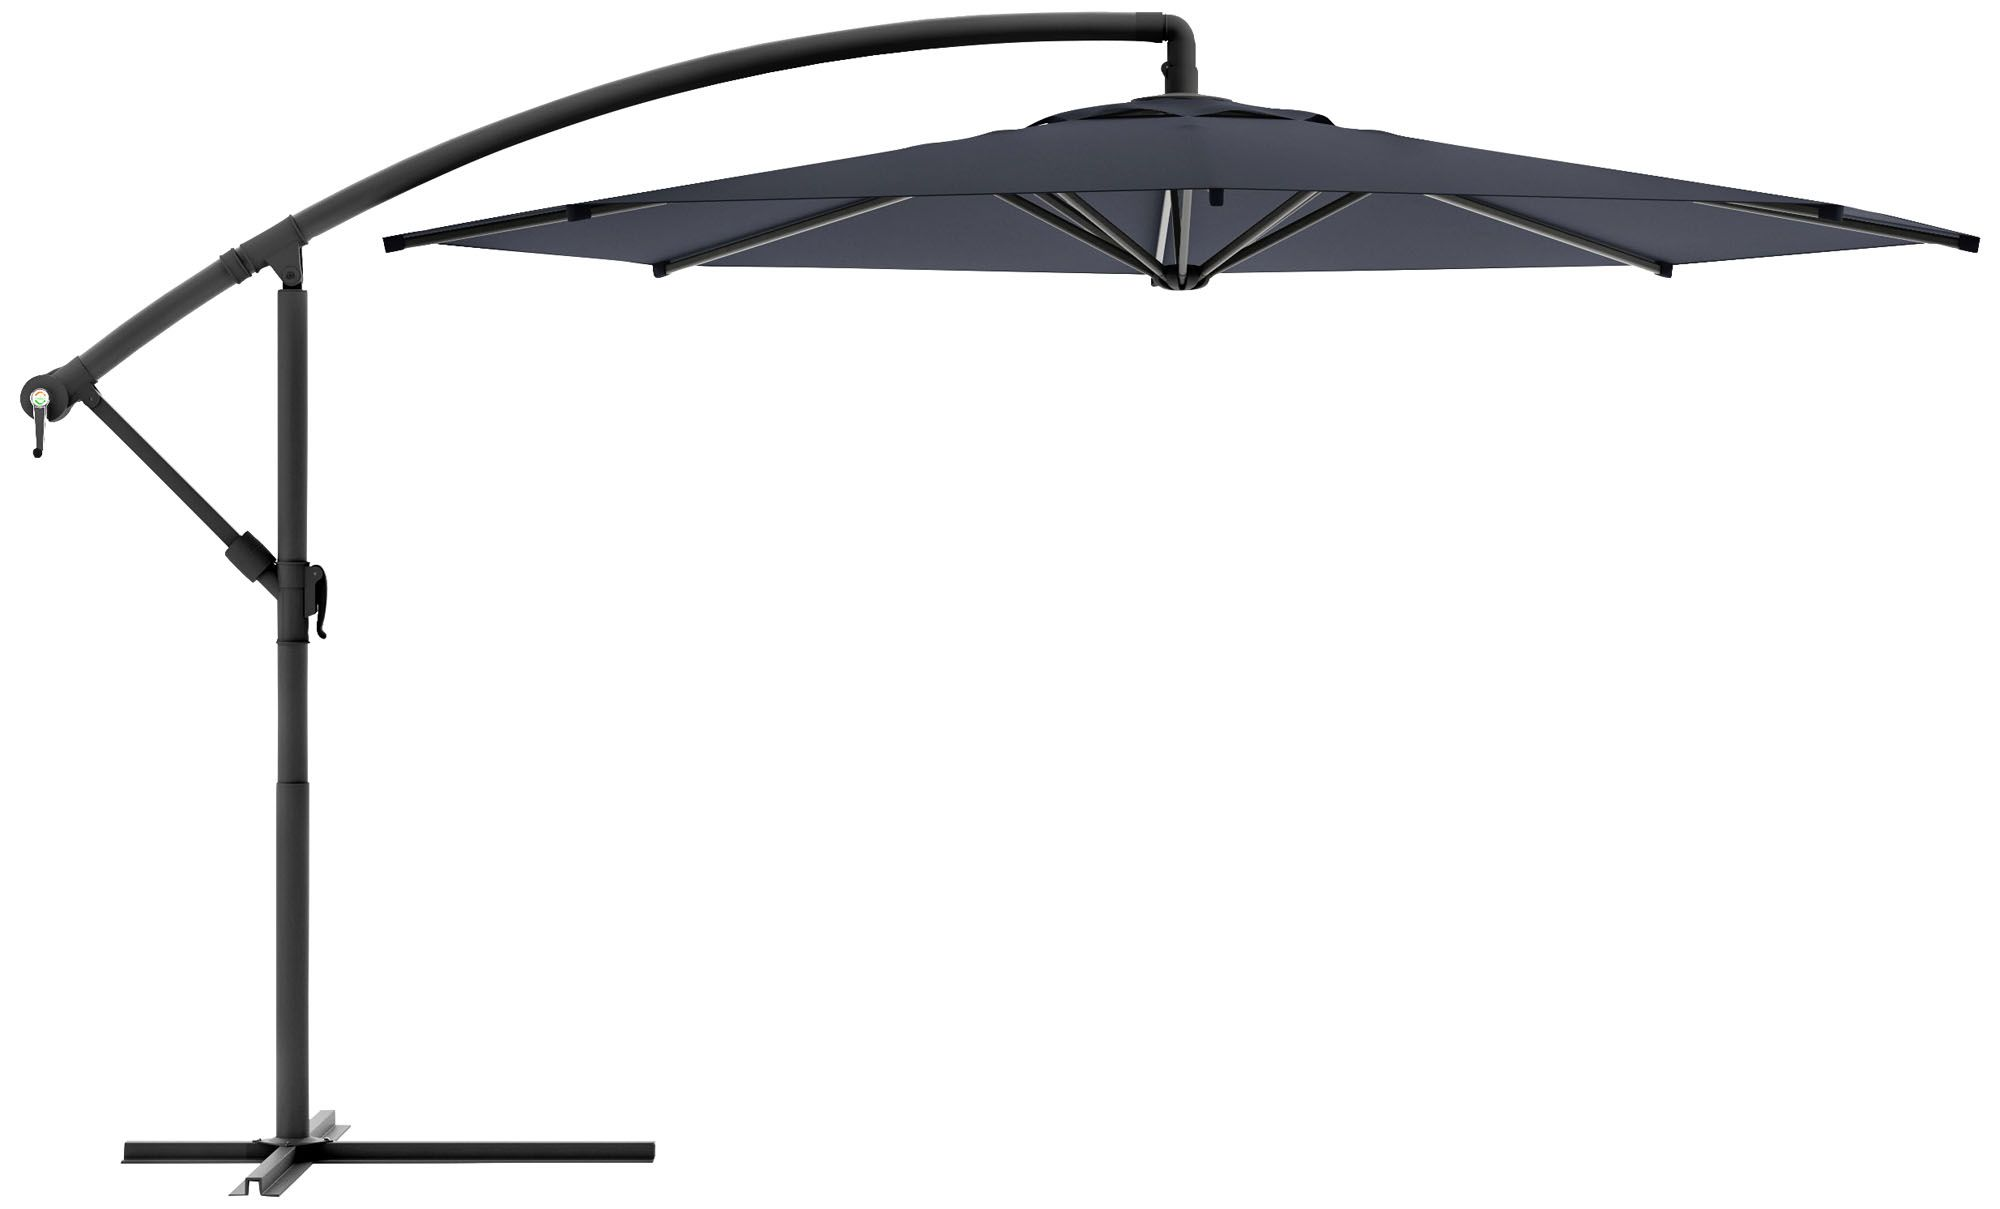 Amazing Meco 9 3/4 Foot Black Fabric Offset Patio Umbrella